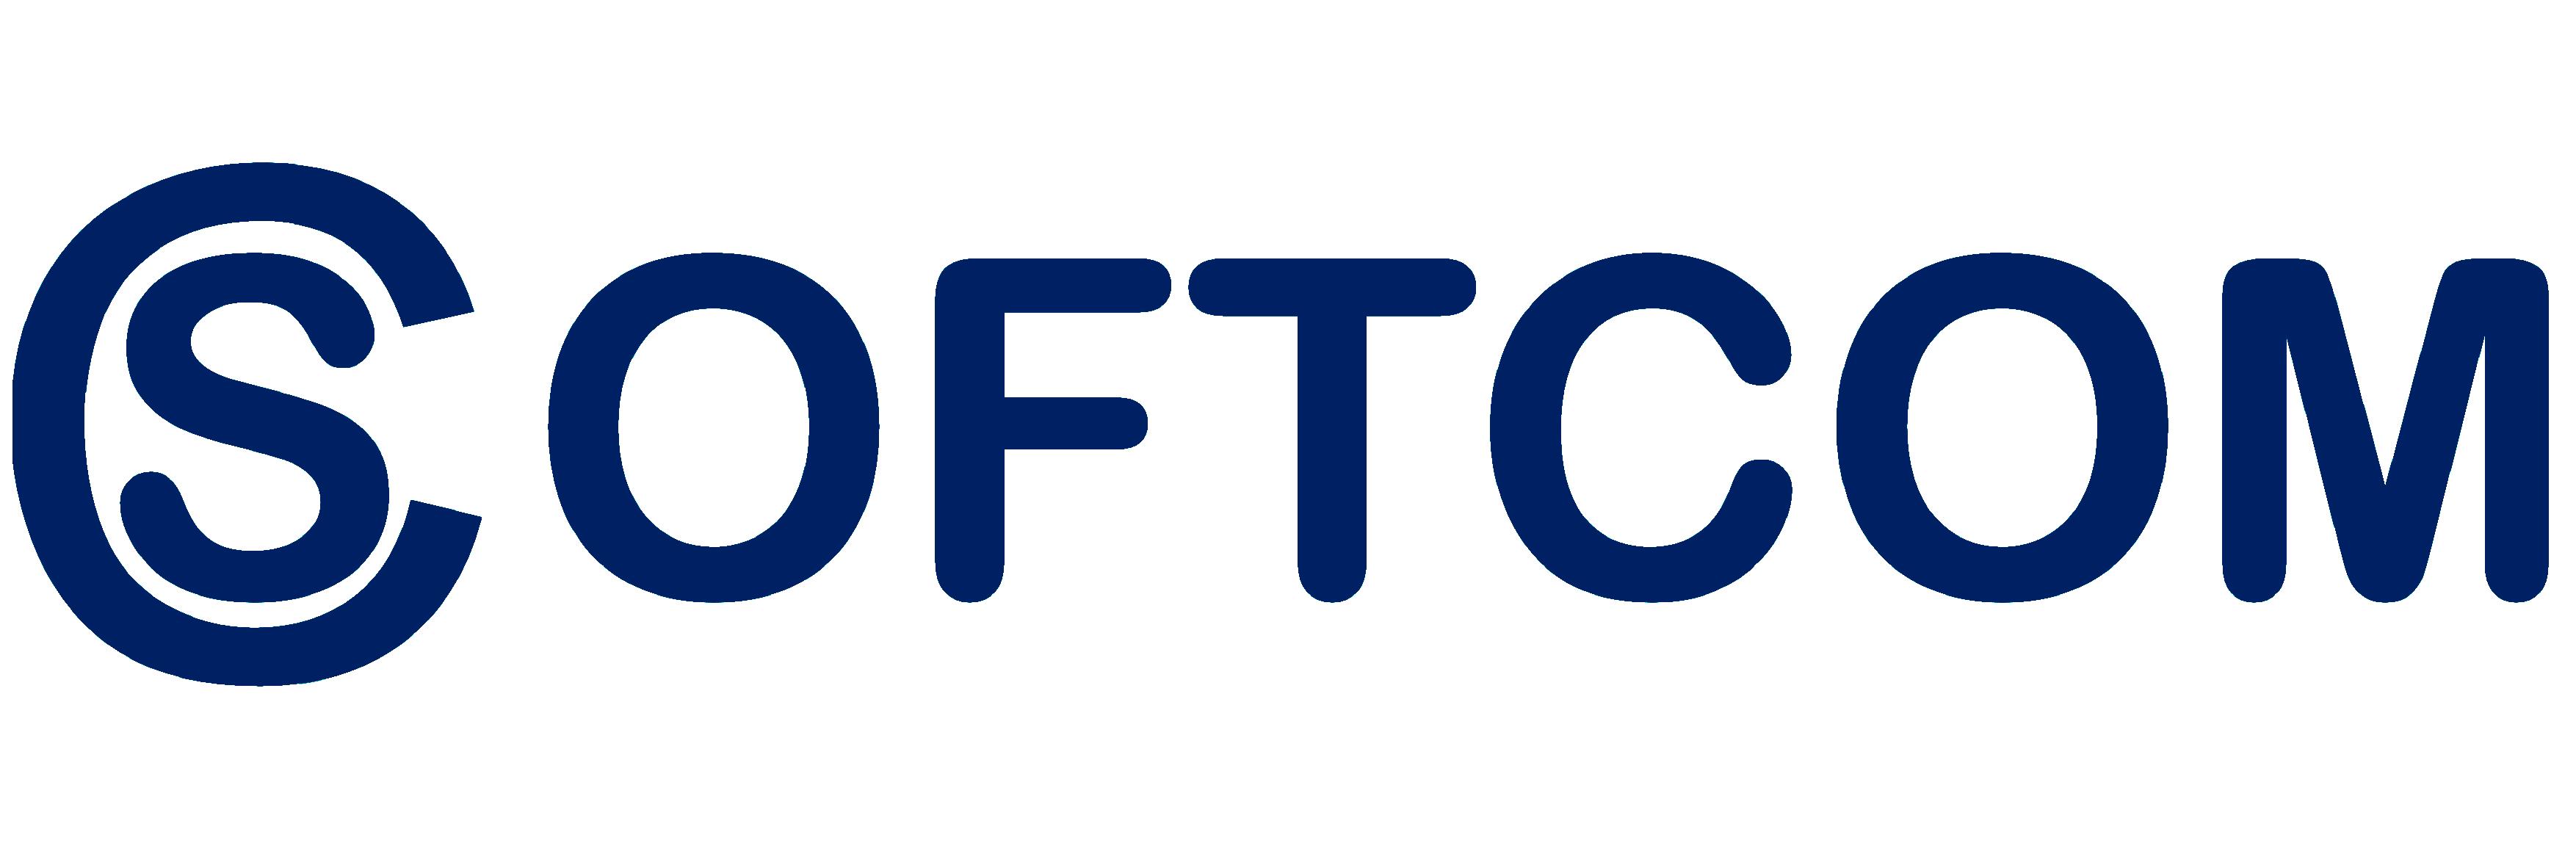 Softcom e.K. - IT-Beratung & Projektmanagement